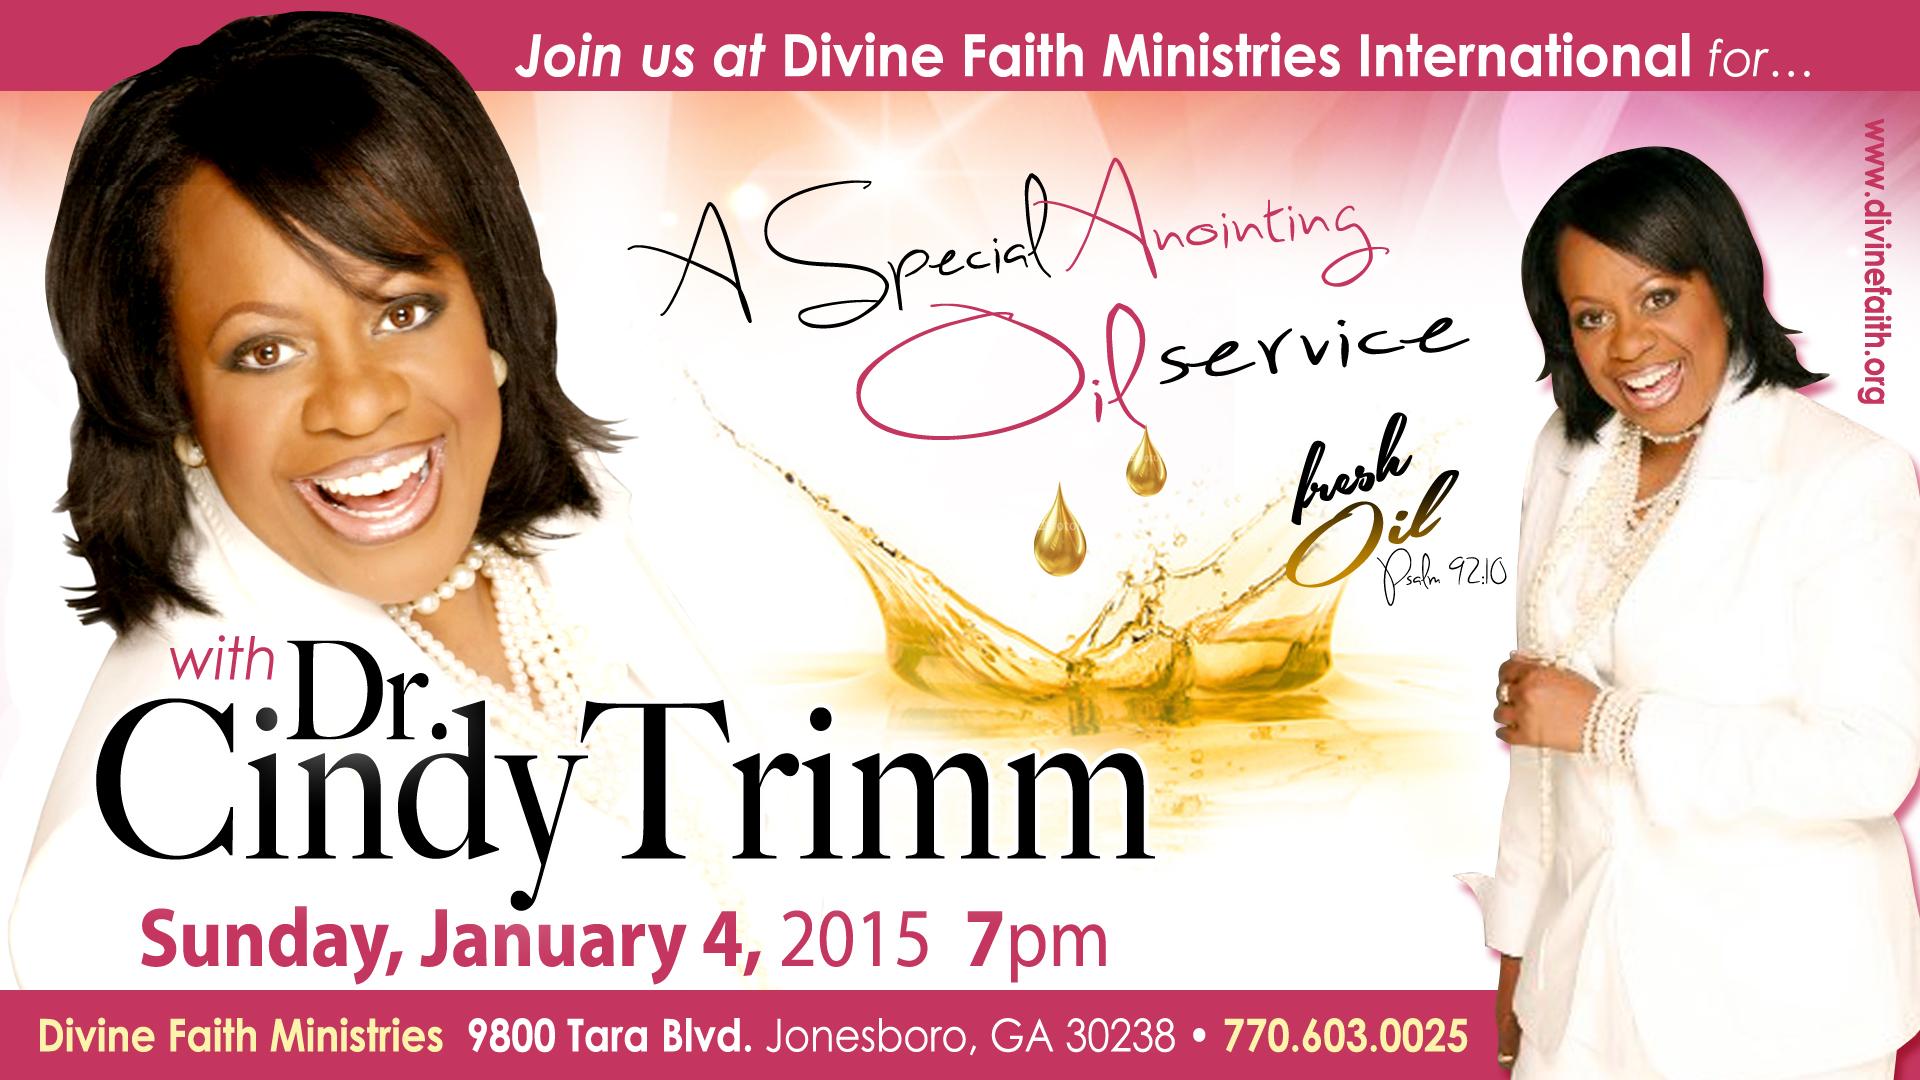 Dr cindy trimm 7pm divine faith ministries